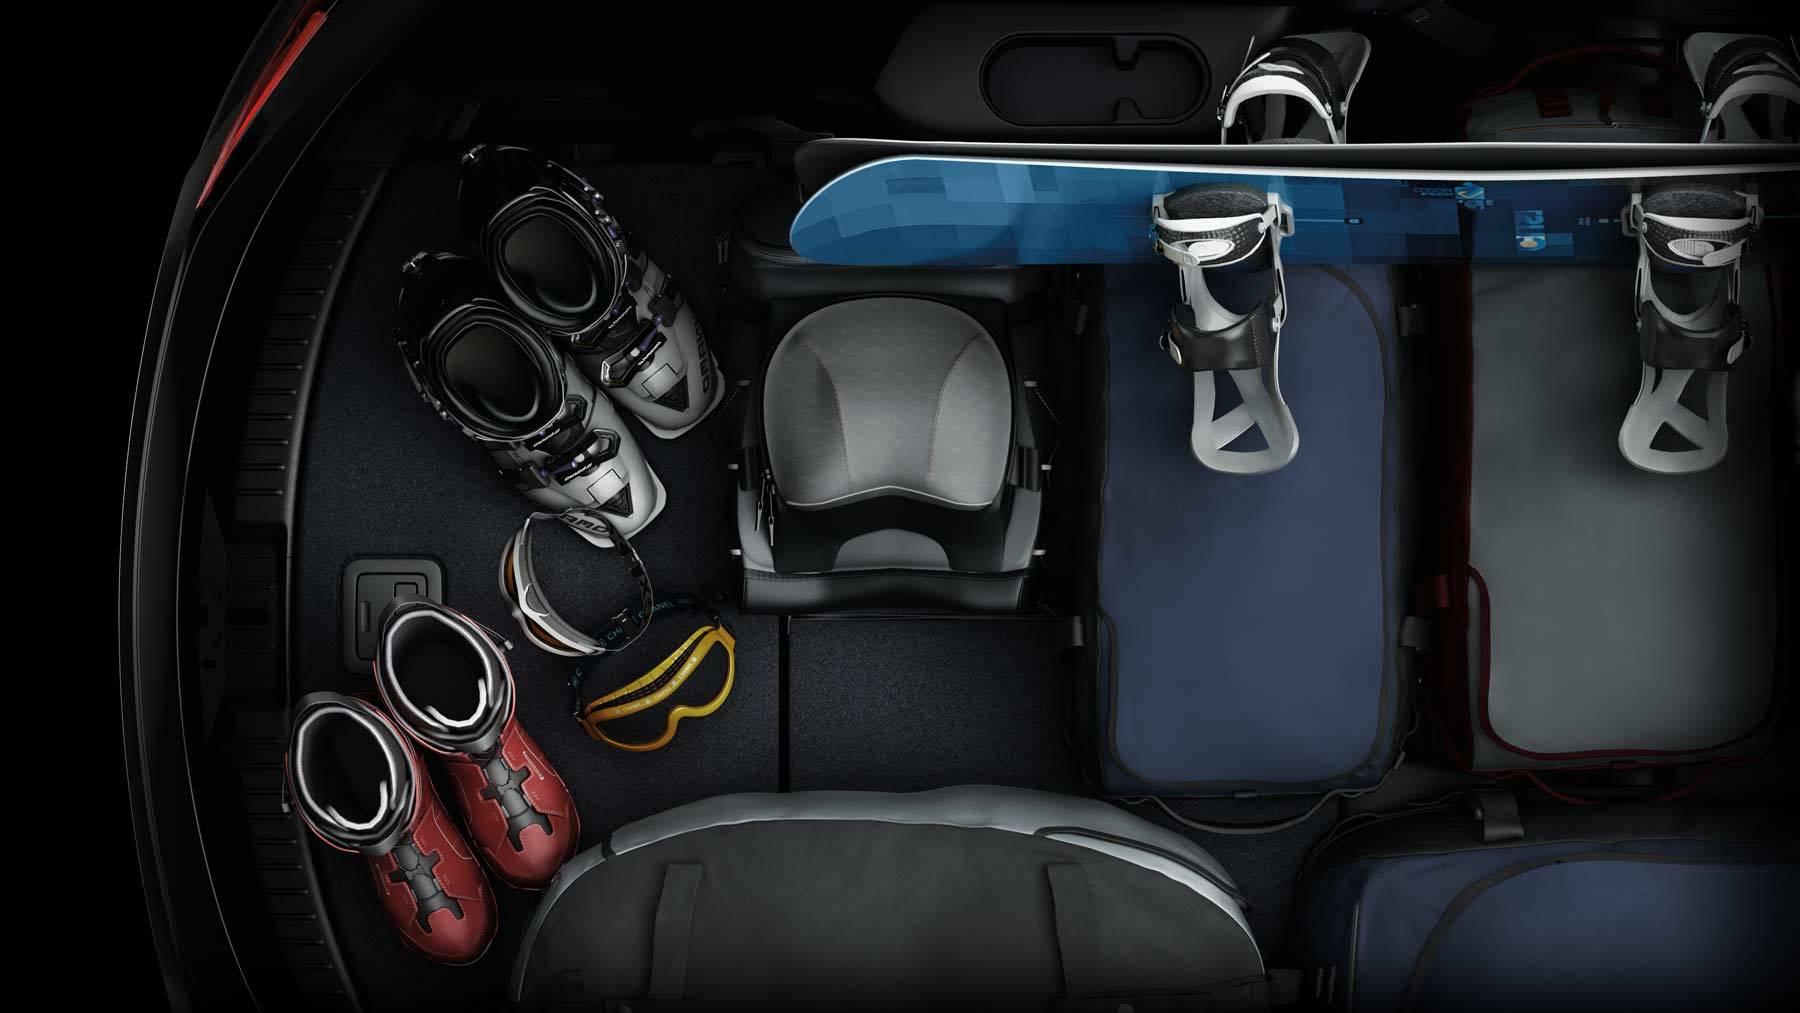 Ample Storage in the 2019 Mazda CX-9